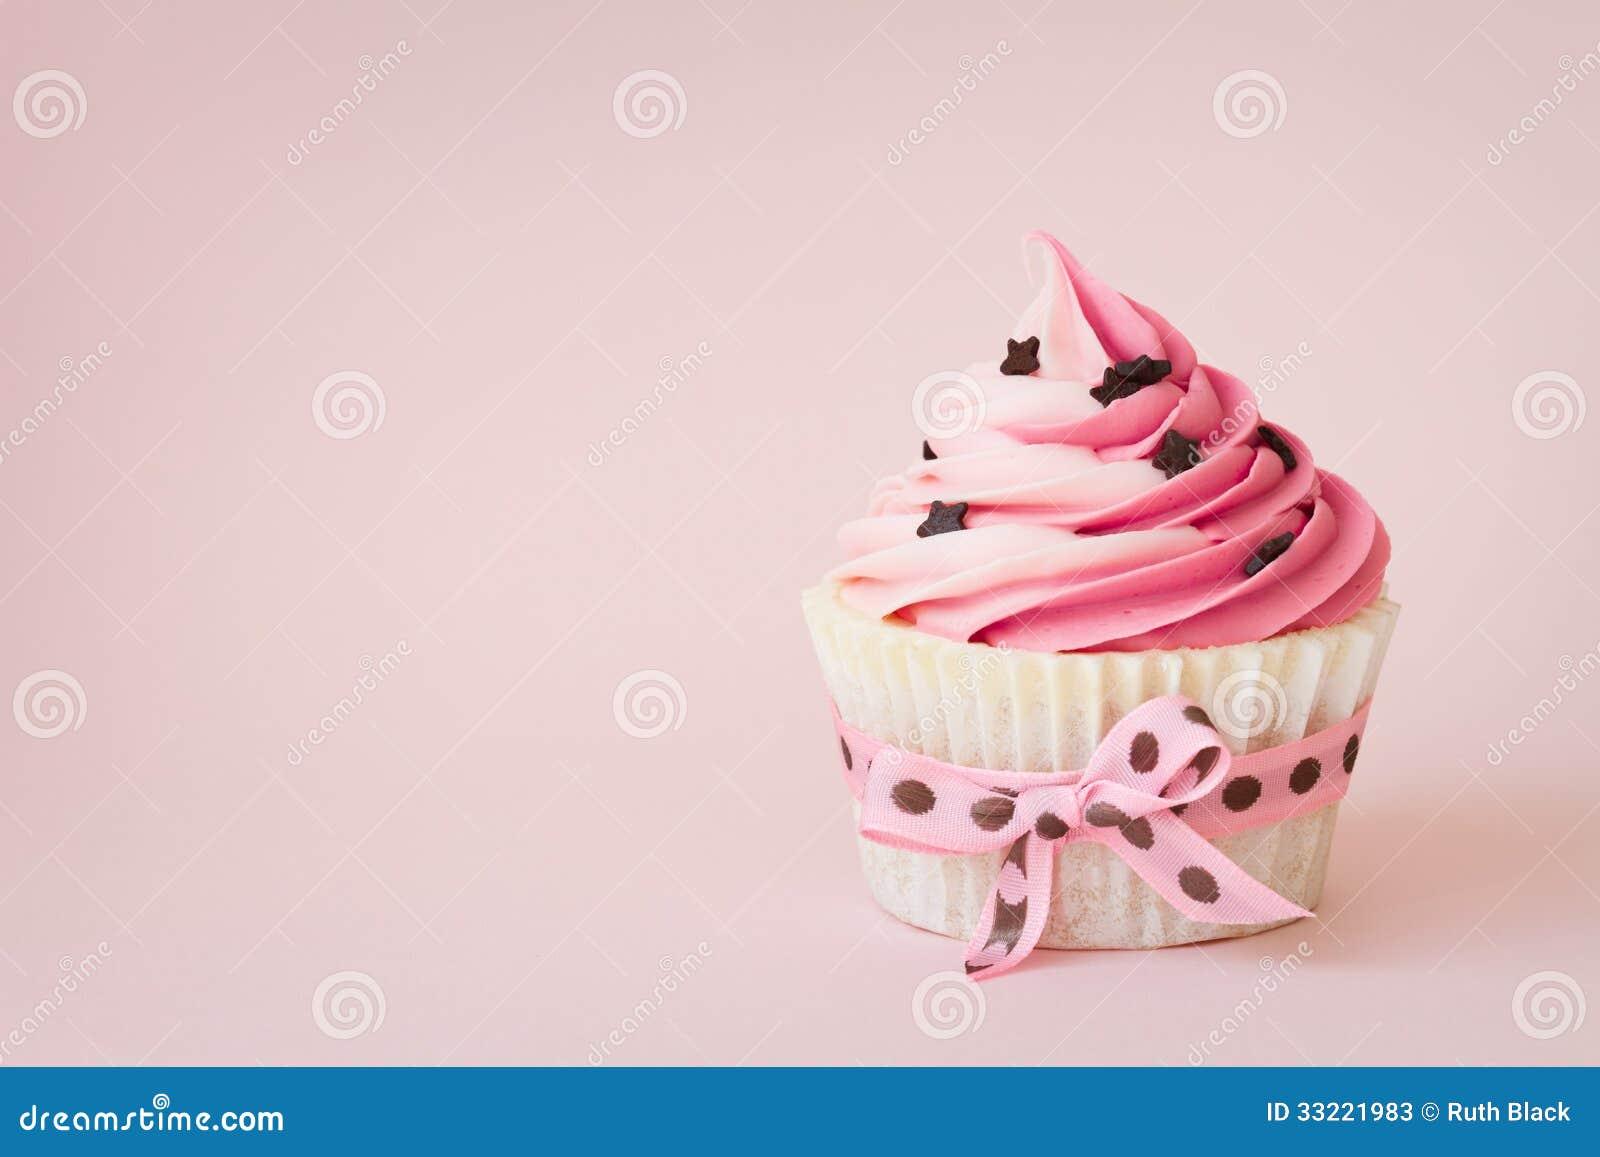 Pink Cupcake Stock Image Image Of Cake Baked Cupcakes